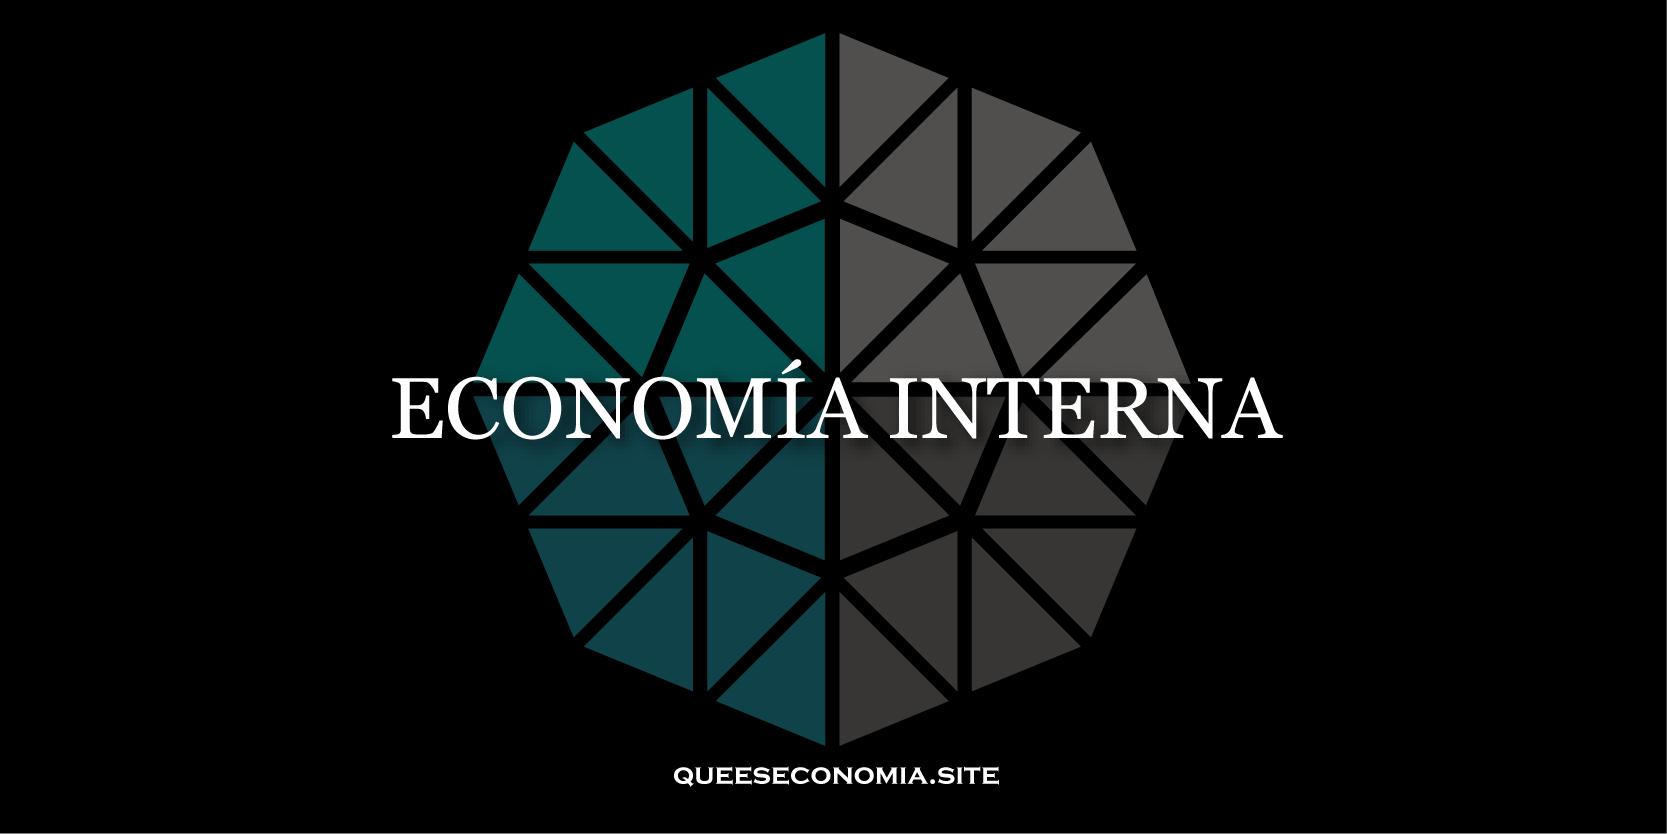 economía interna